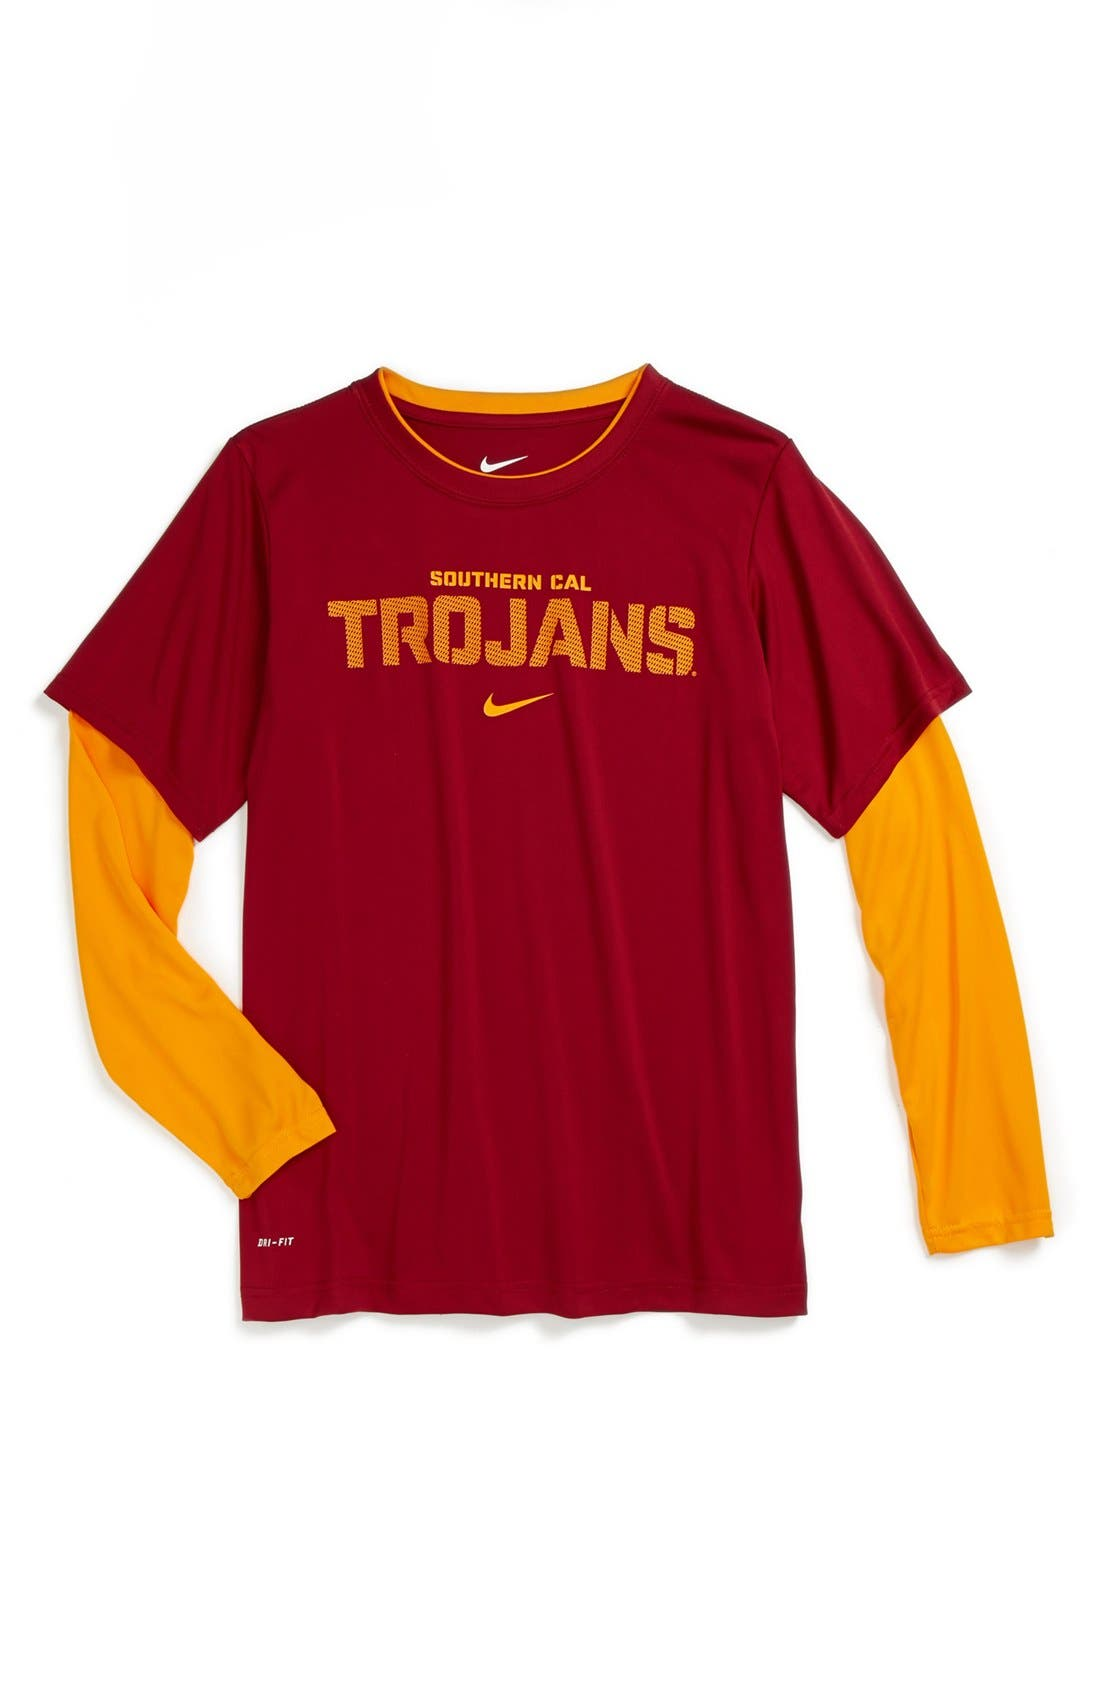 Main Image - Nike 'Southern California Trojans' Dri-FIT Layered Sleeve Sport T-Shirt (Big Boys)